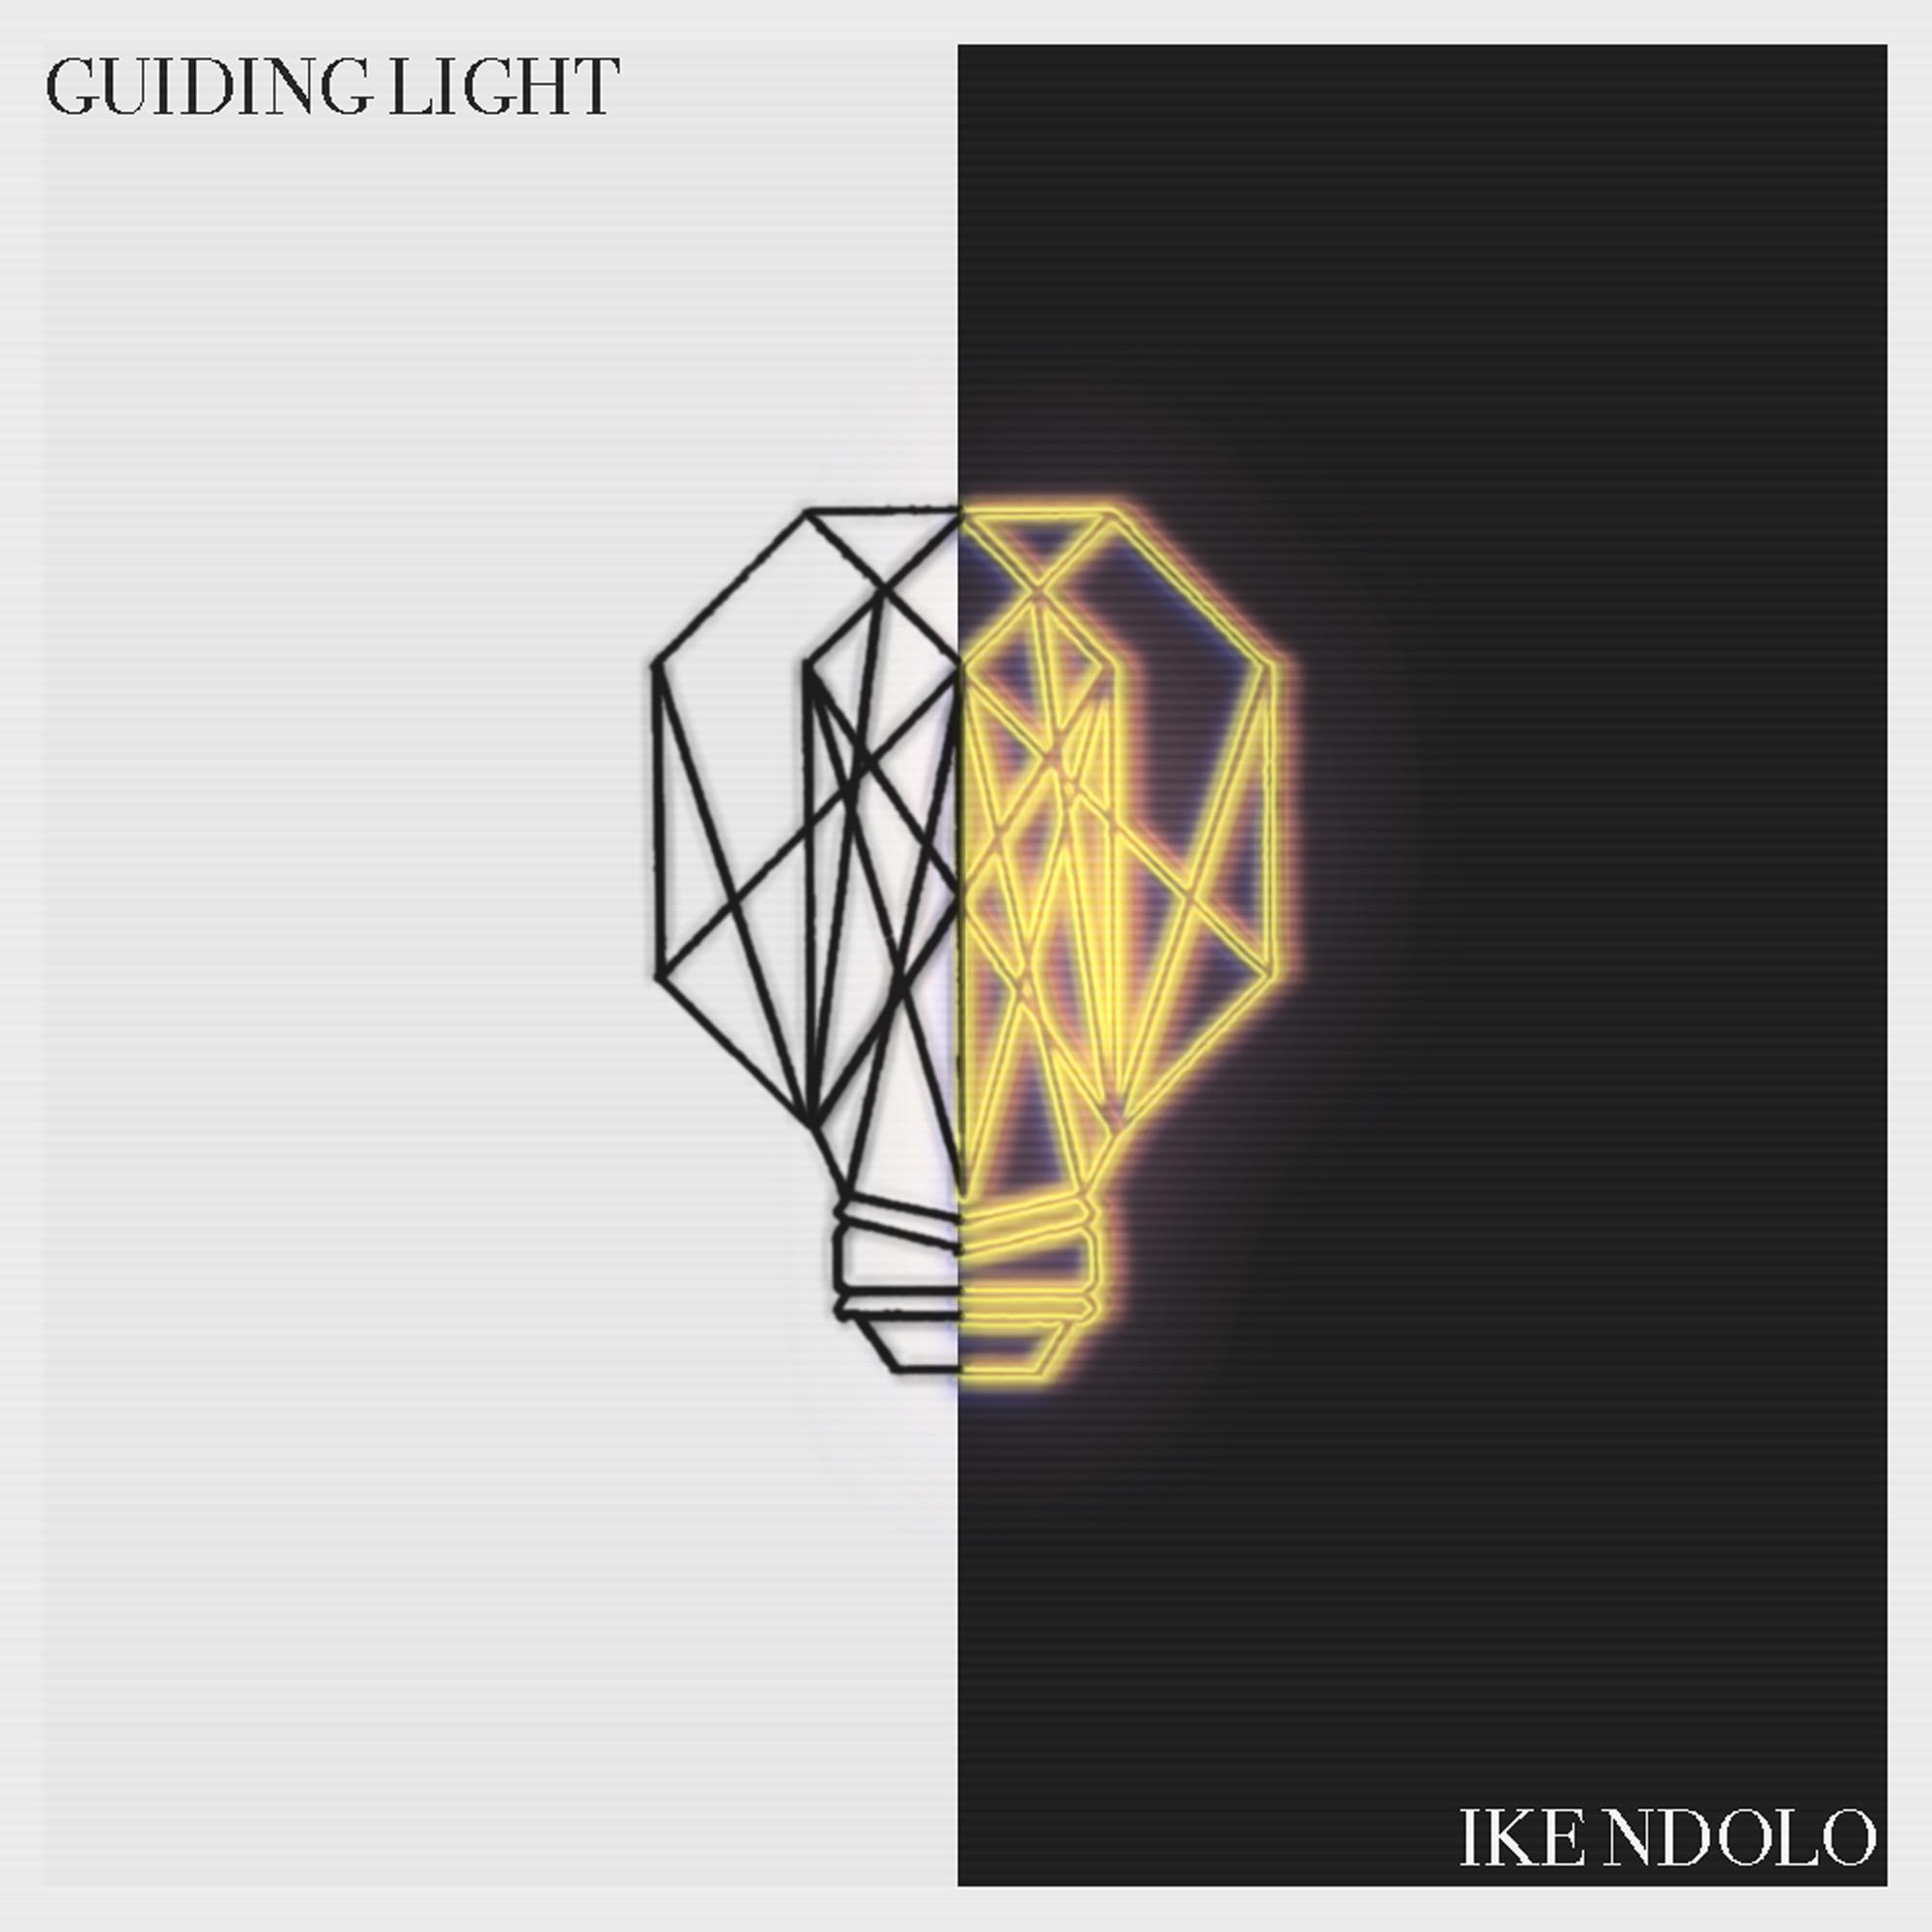 GUIDING LIGHT - SINGLE